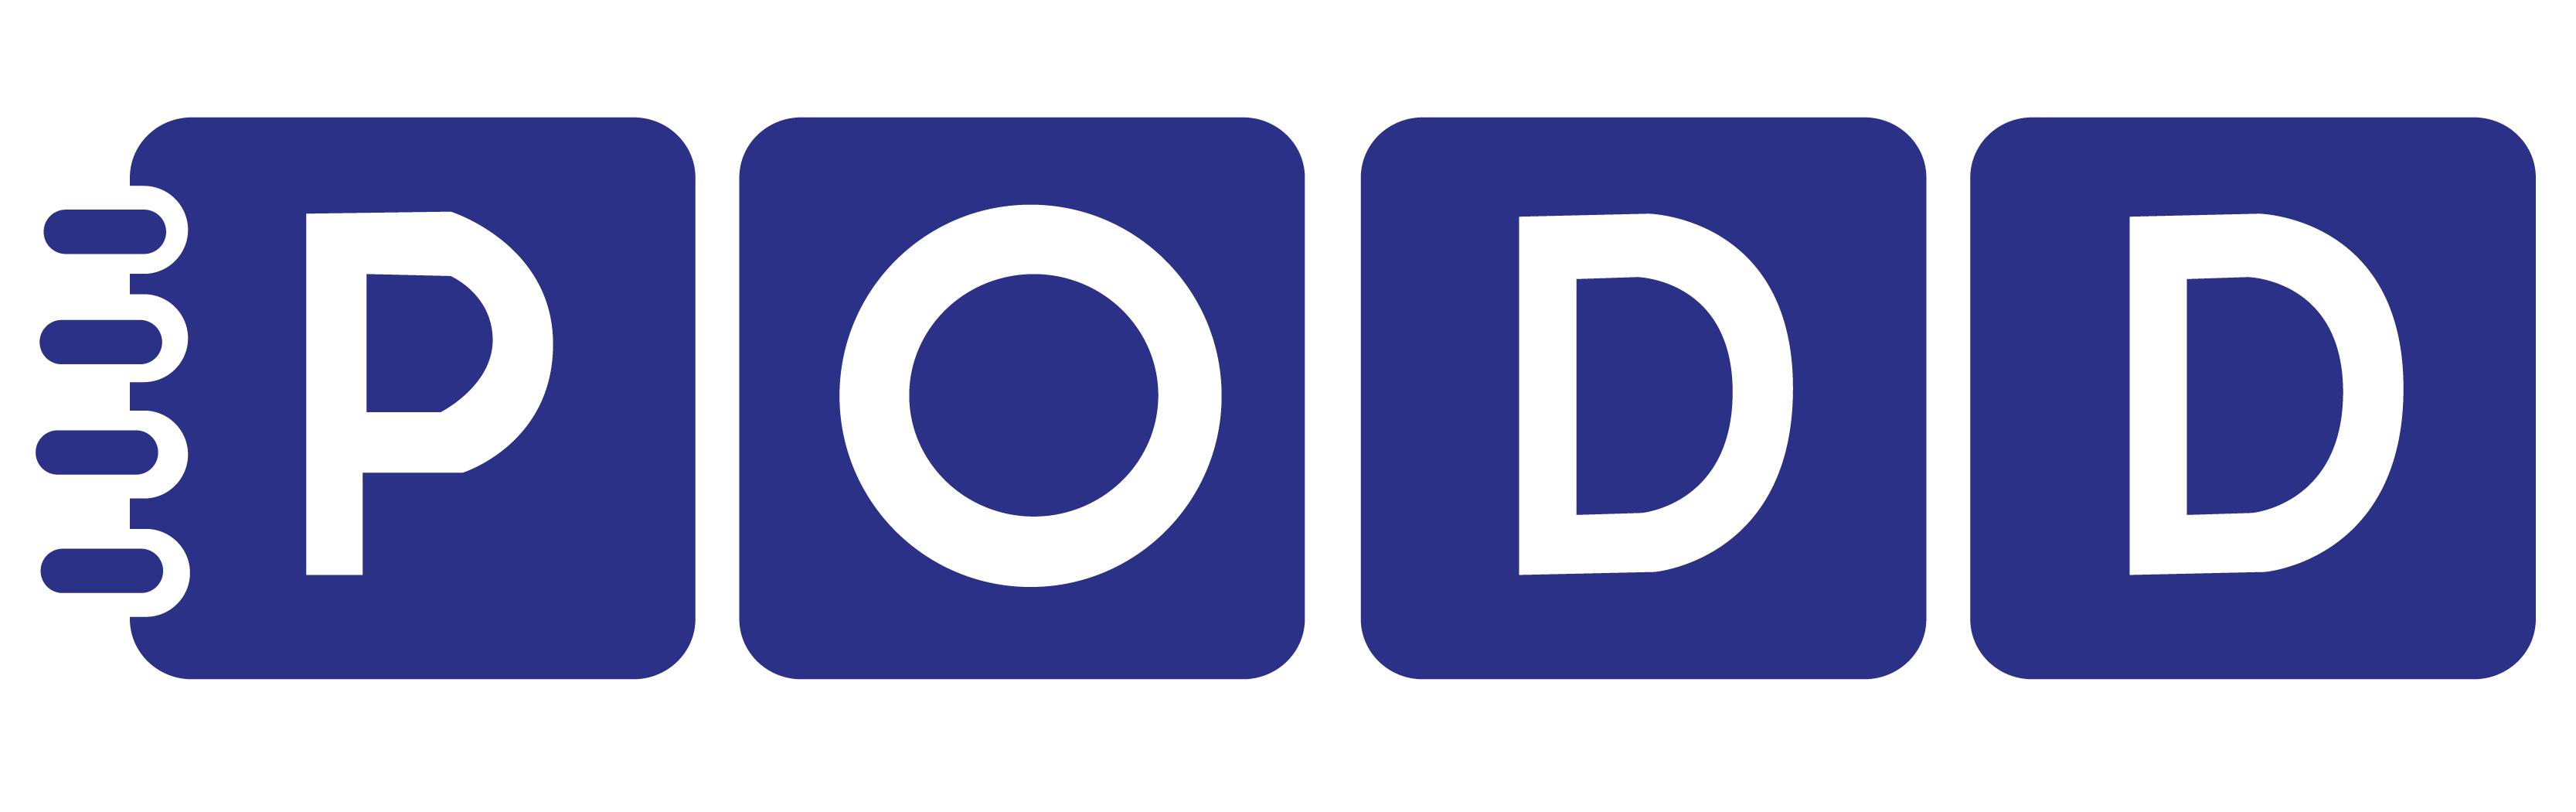 PODD, Pragmatic Organisation Dynamic Display